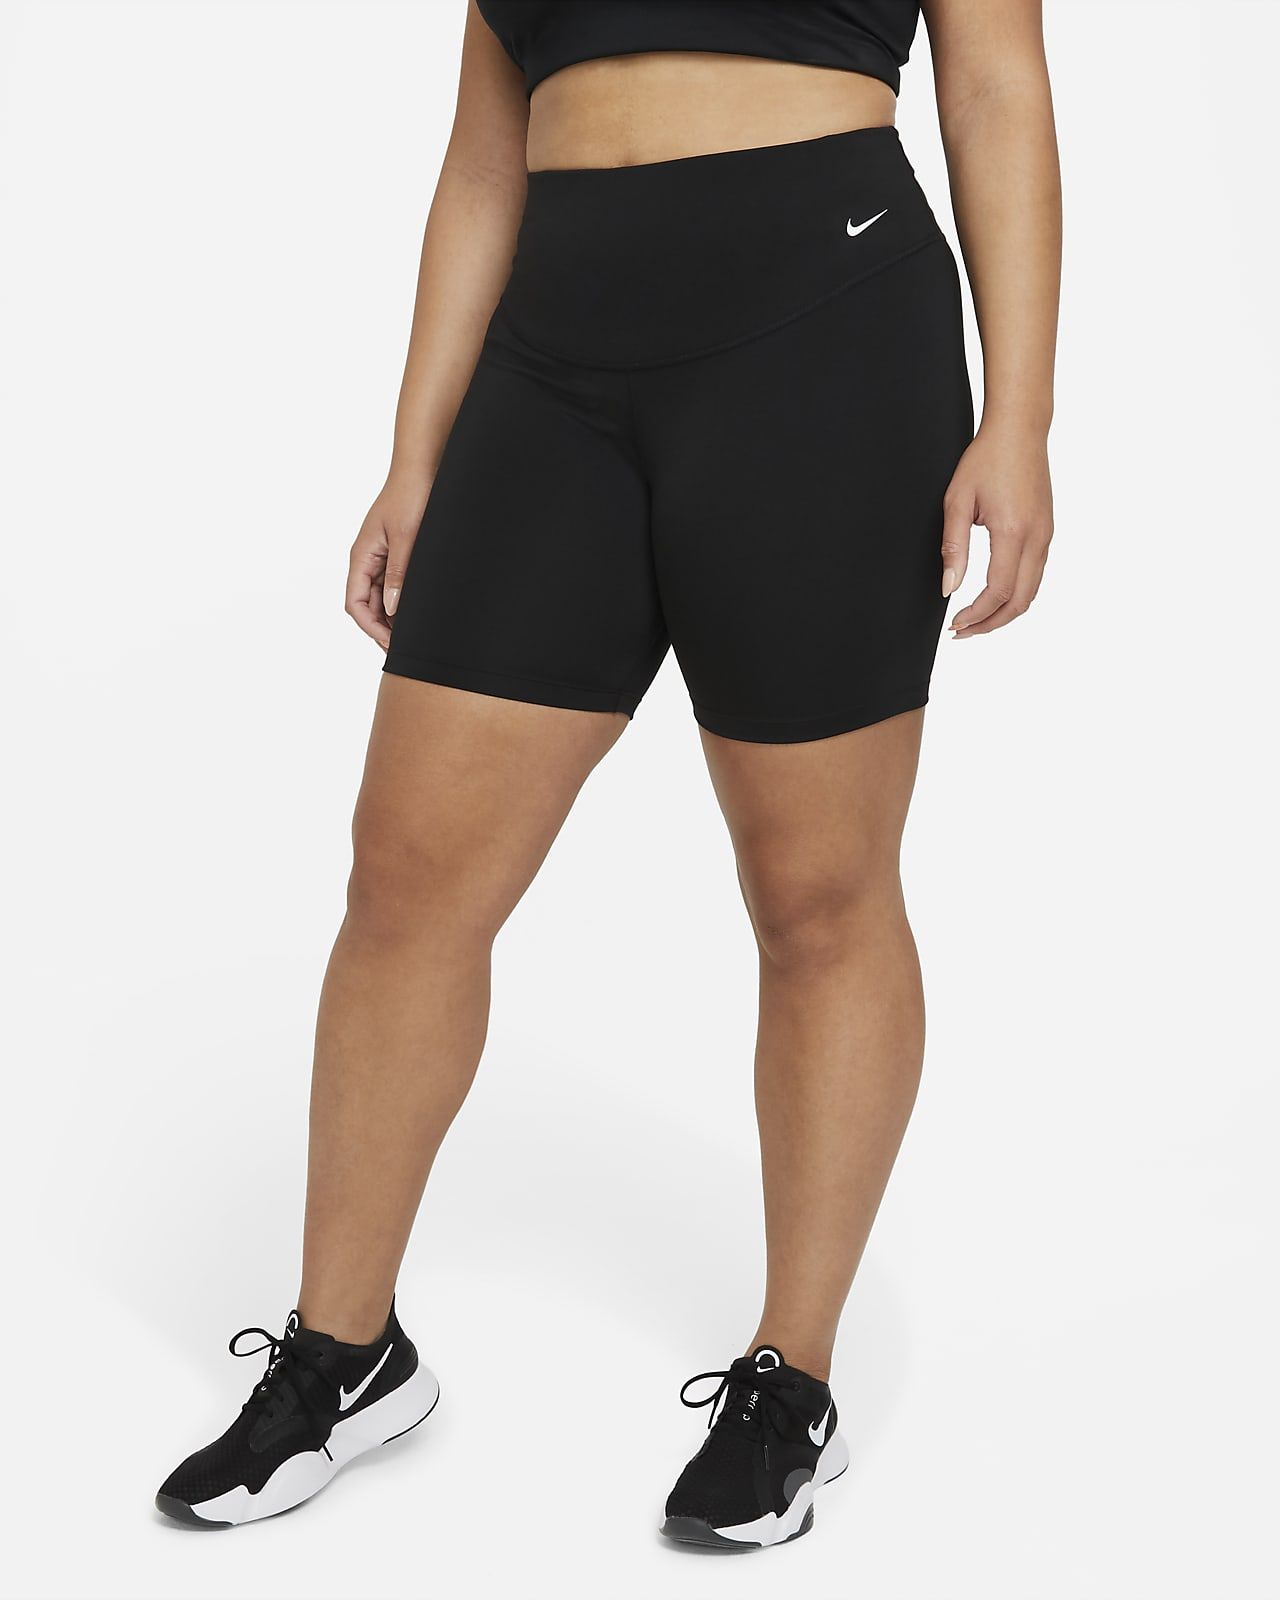 Nike One Pantalón corto de ciclismo de talle medio de 18cm (Talla grande) - Mujer